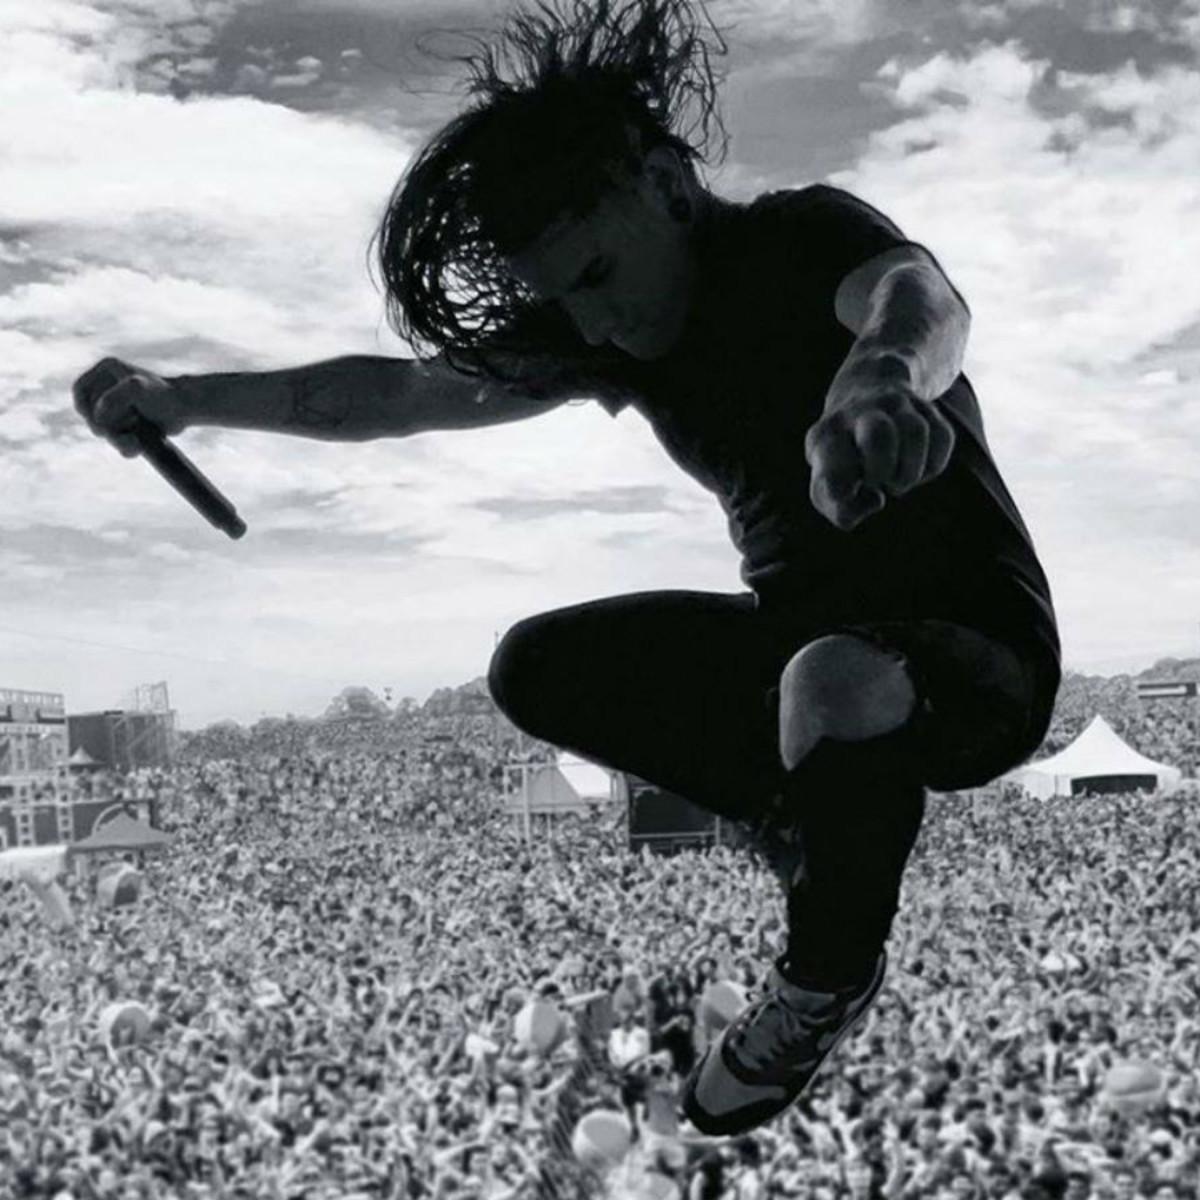 Skrillex musician Free Press Summer Fest FPSF February 2015